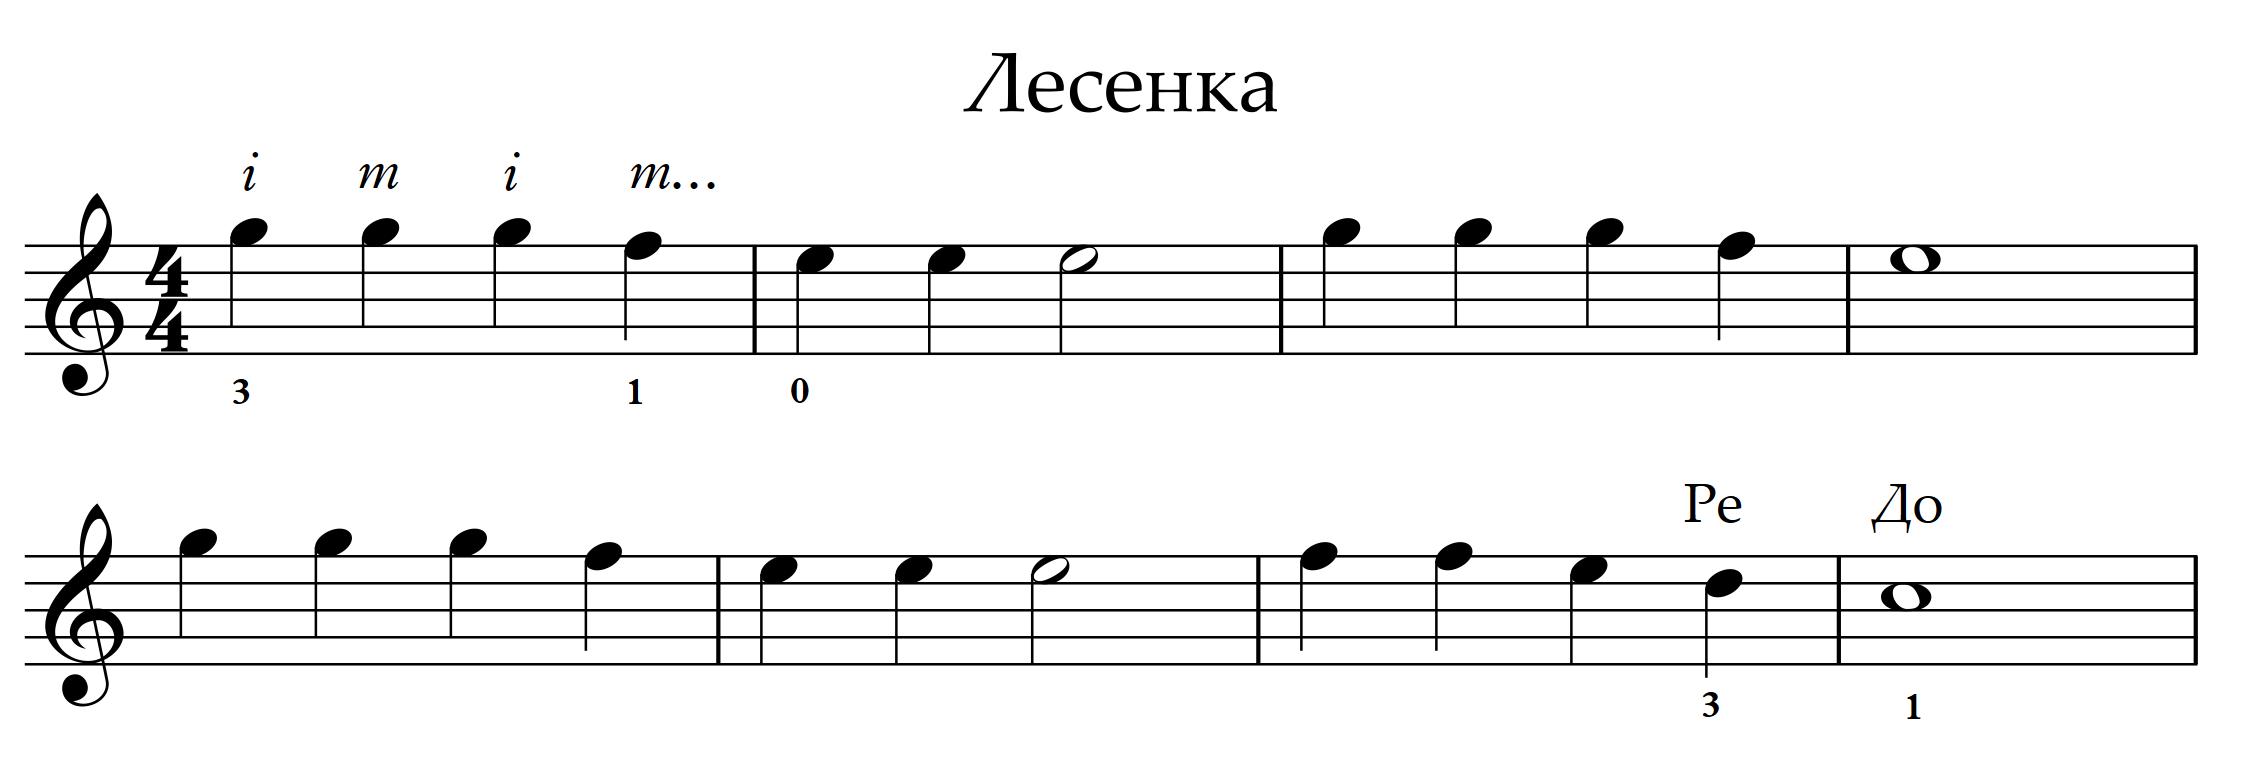 4 Lesenka